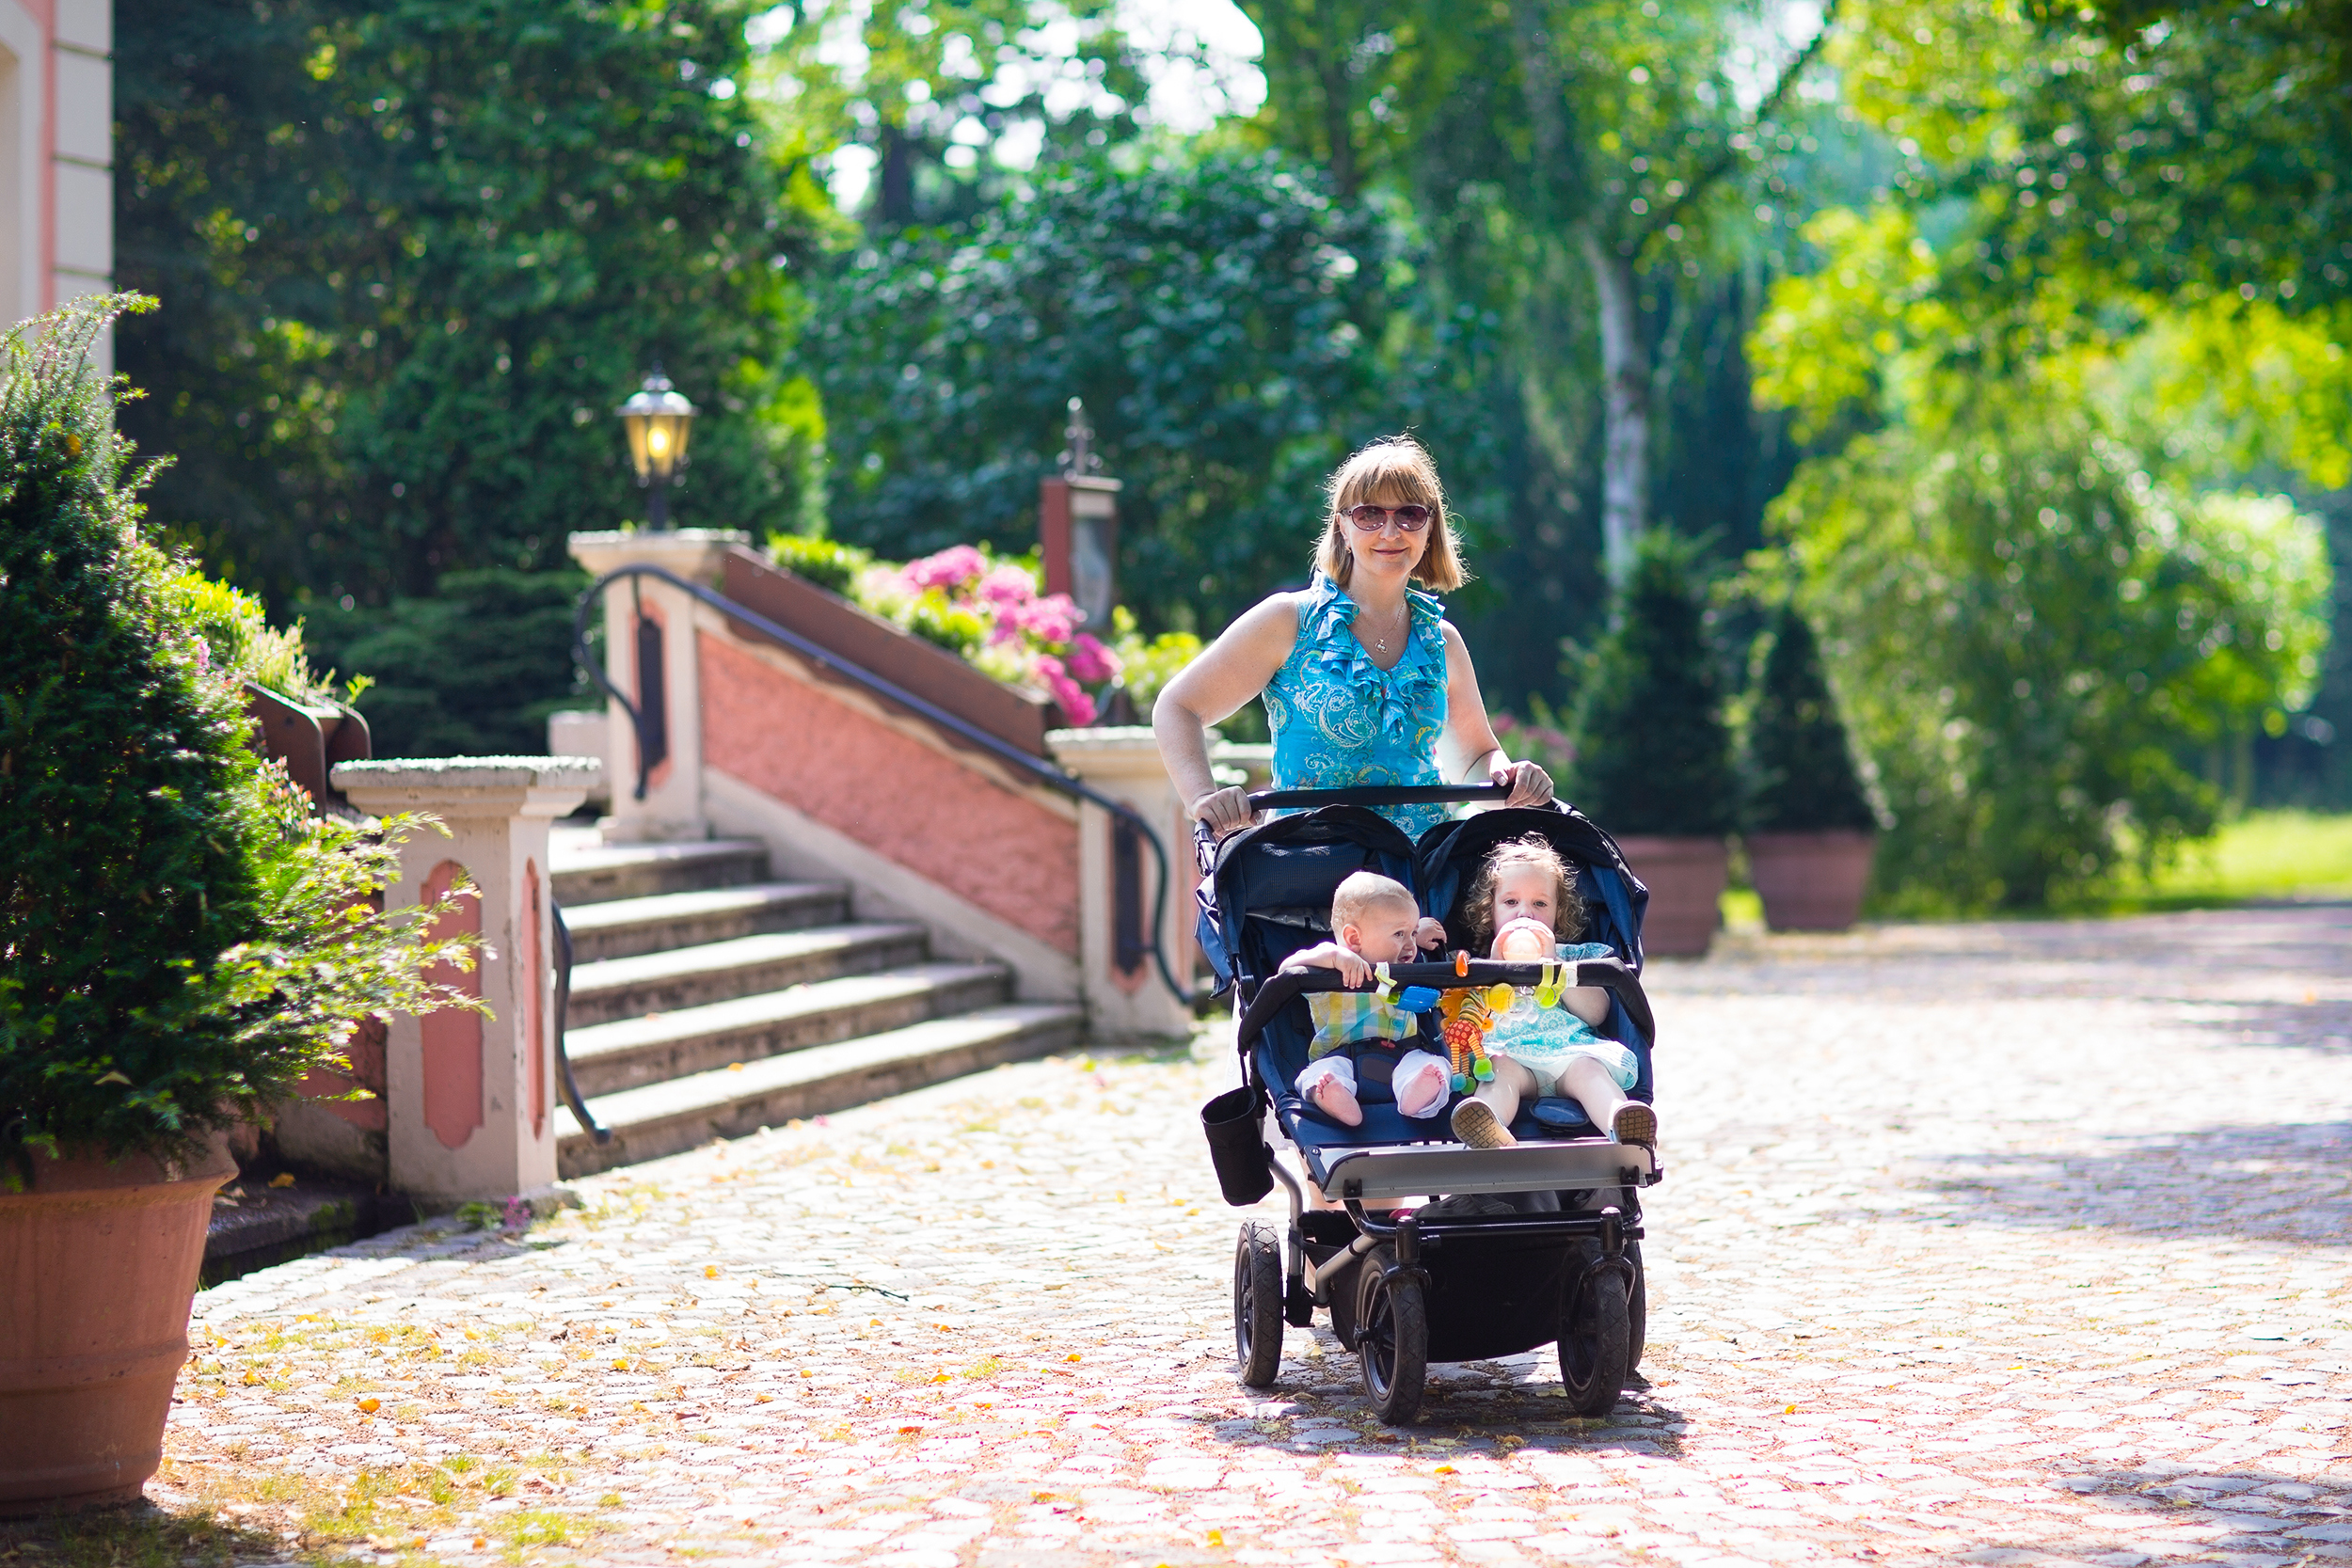 Lincoln front swivel wheel w release Navigator Lite Double Baby Jogger